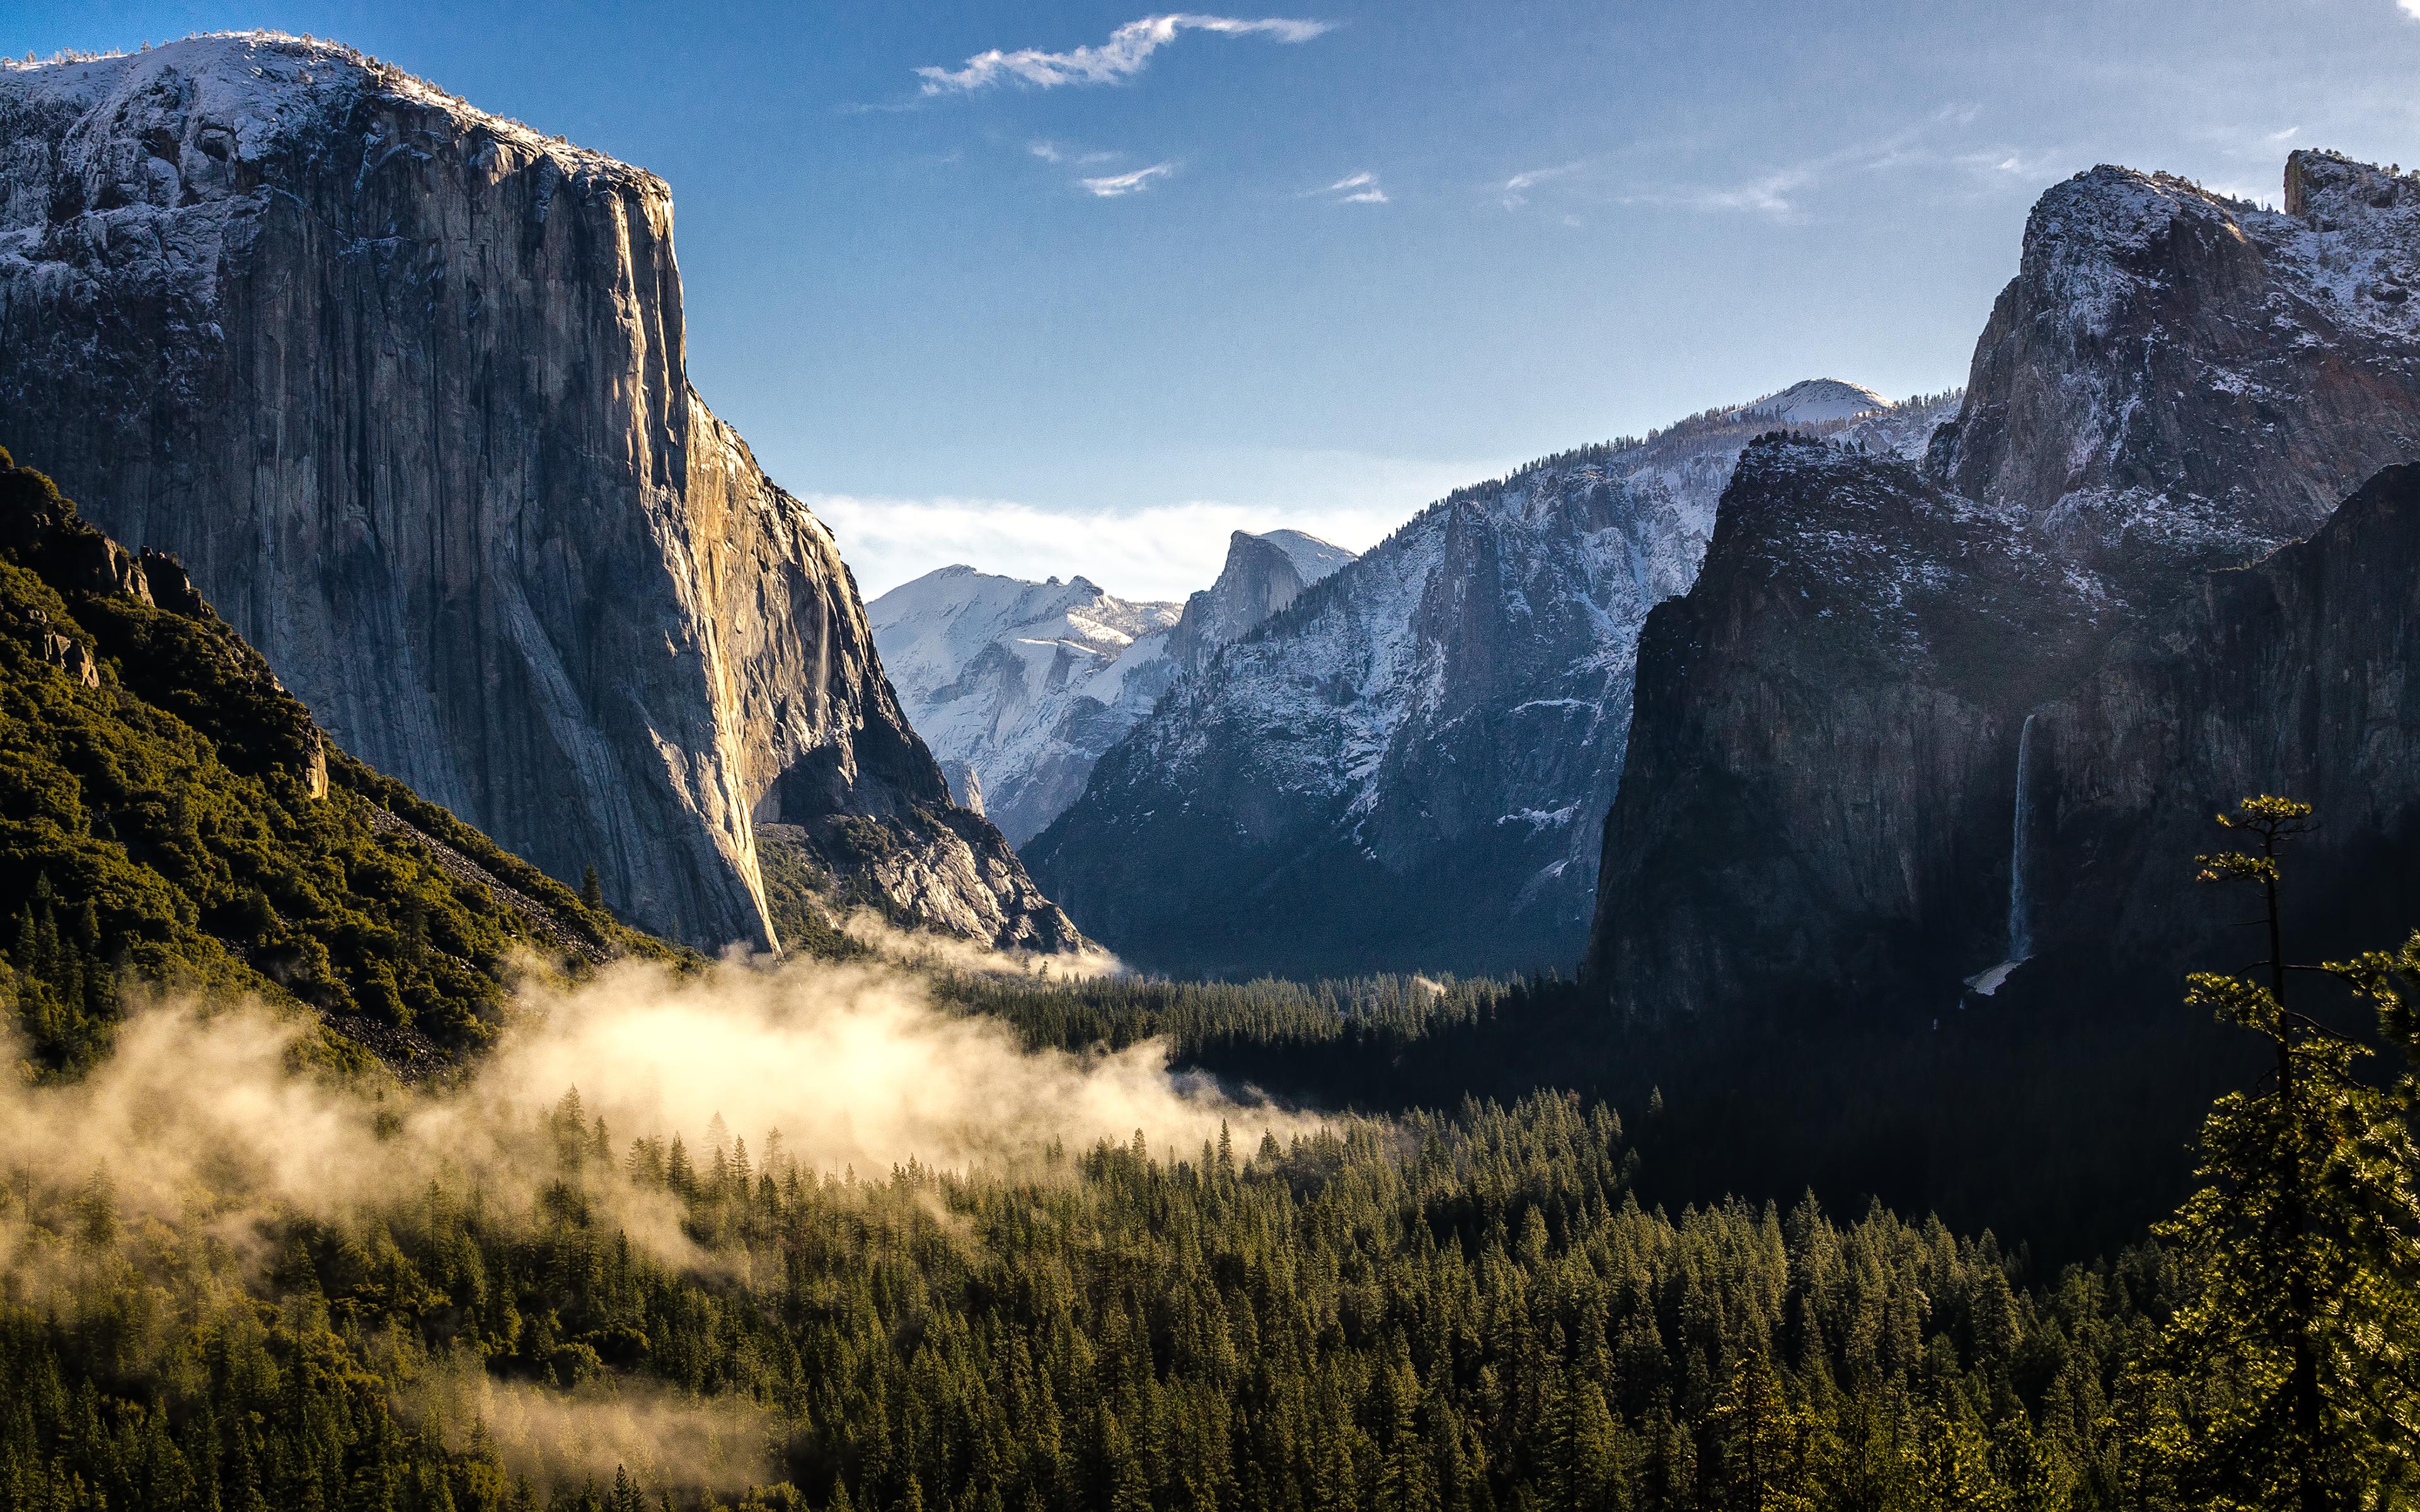 Background image yosemite - Yosemite Wallpapers